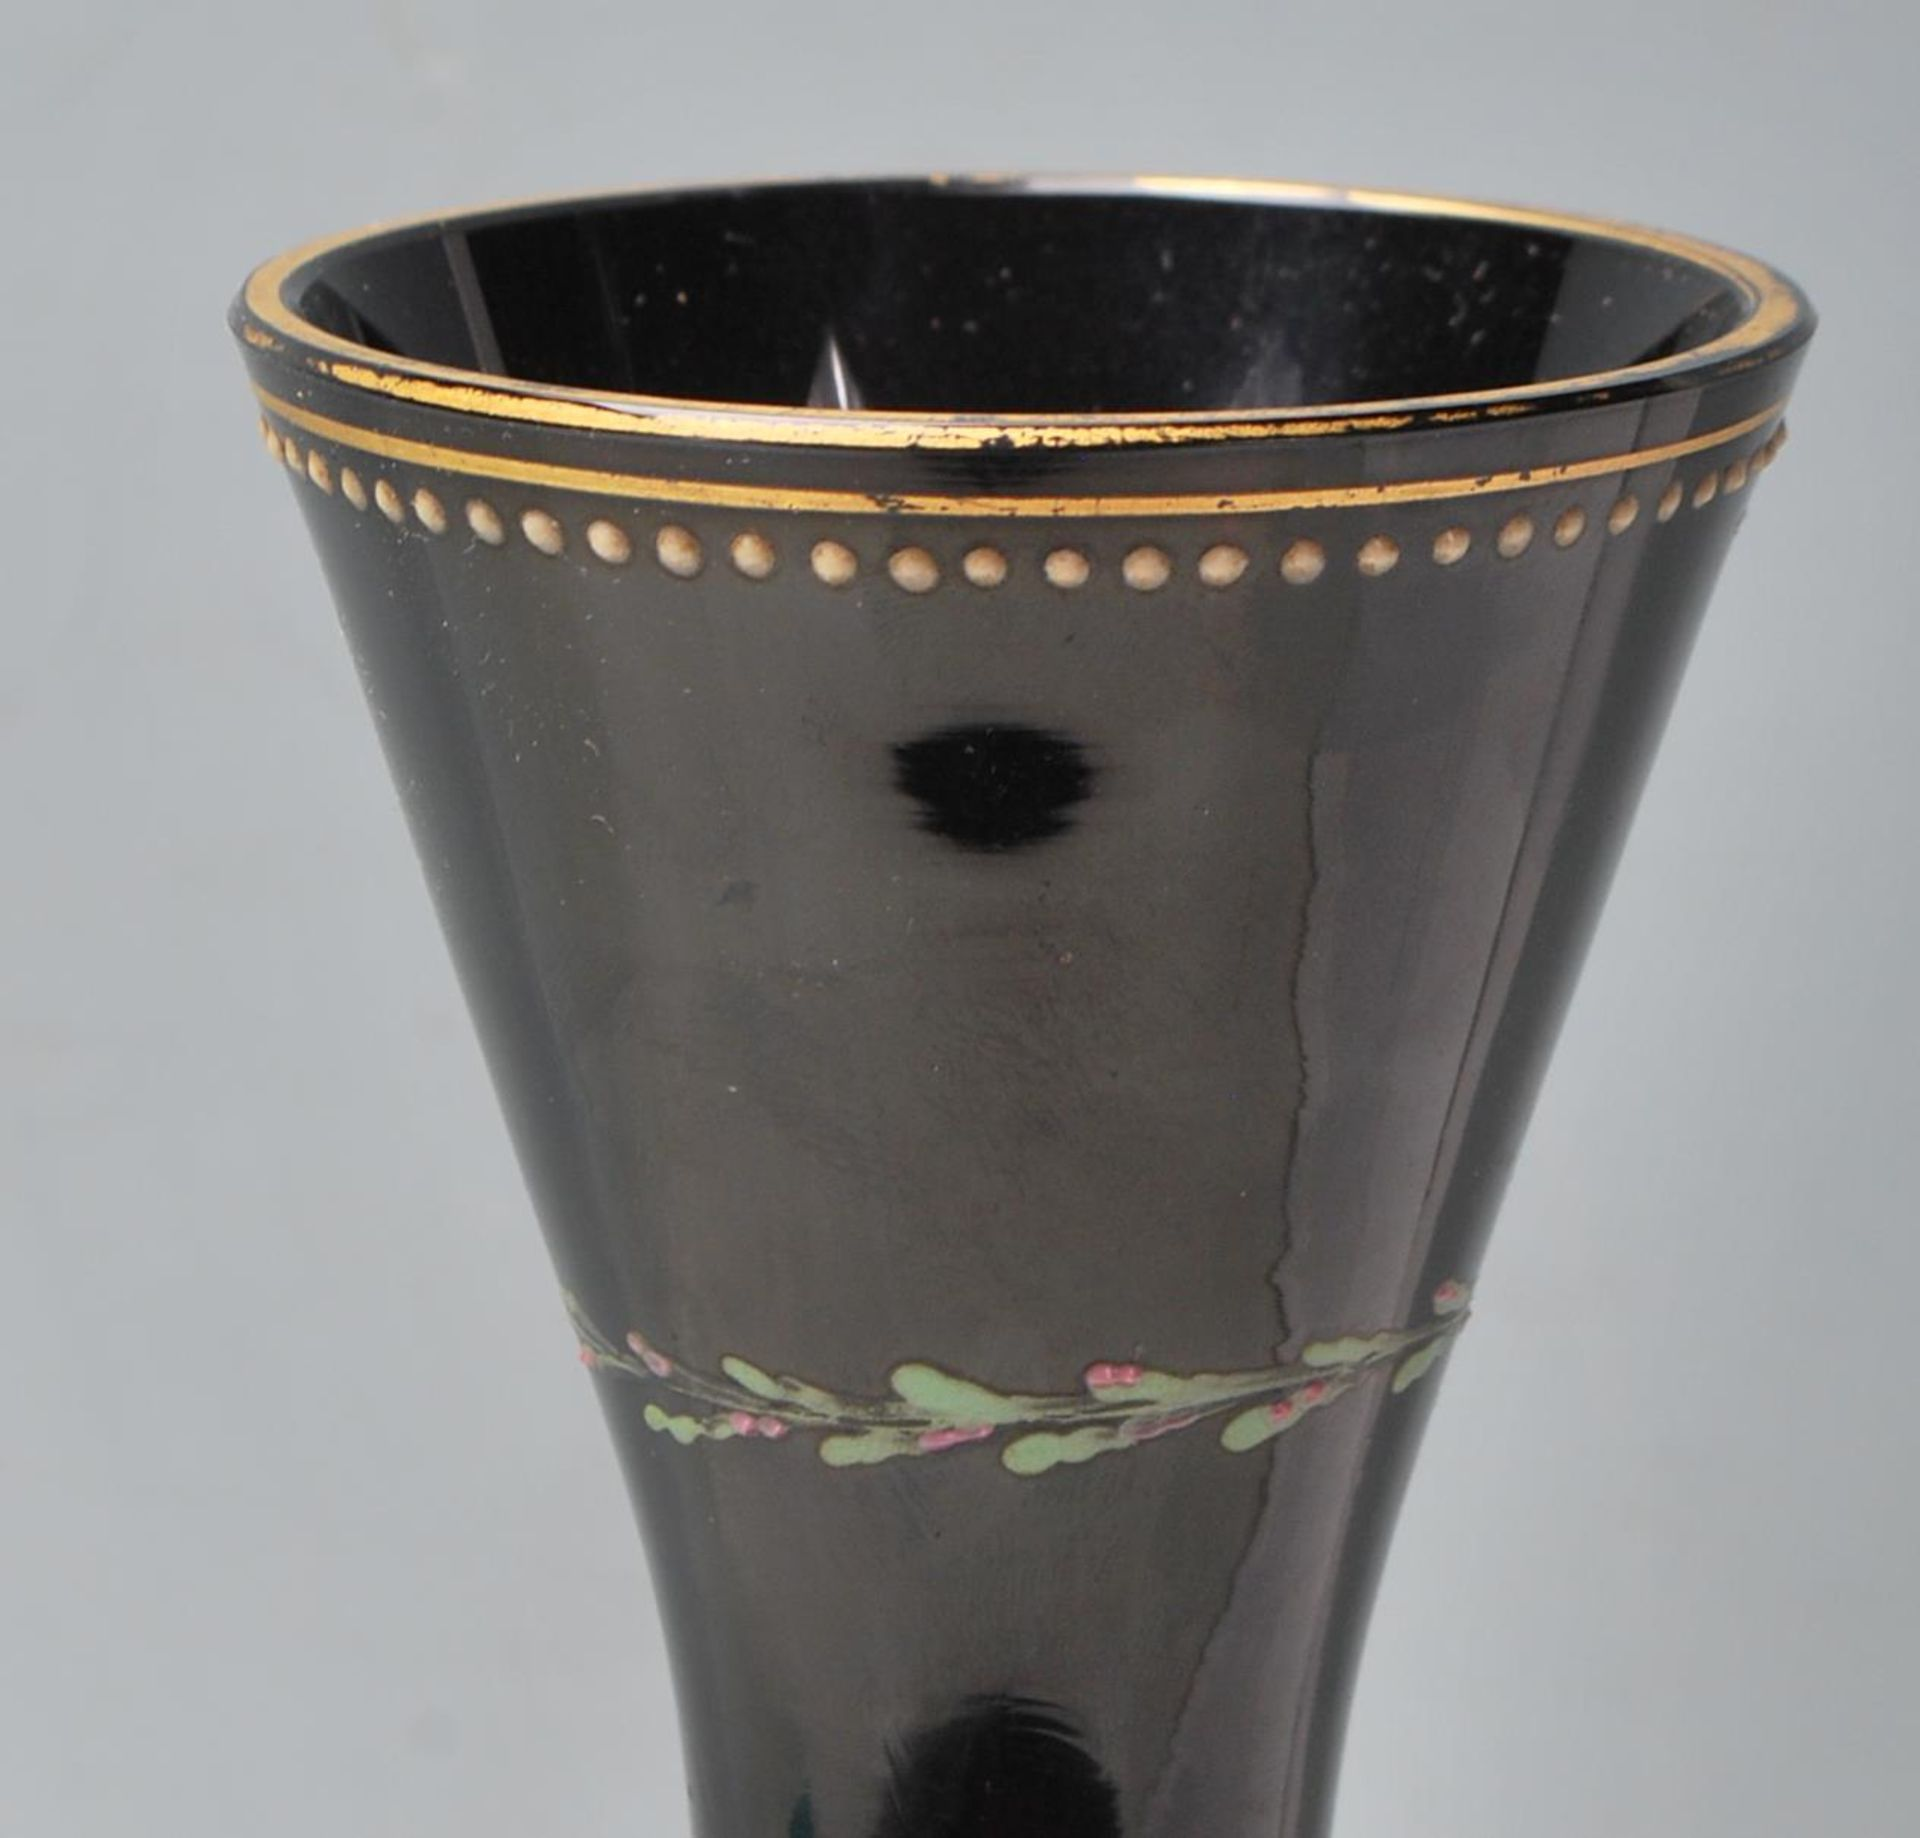 ANTIQUE BLACK AMETHYST BOHEMIAN GLASS VASE - Image 2 of 7